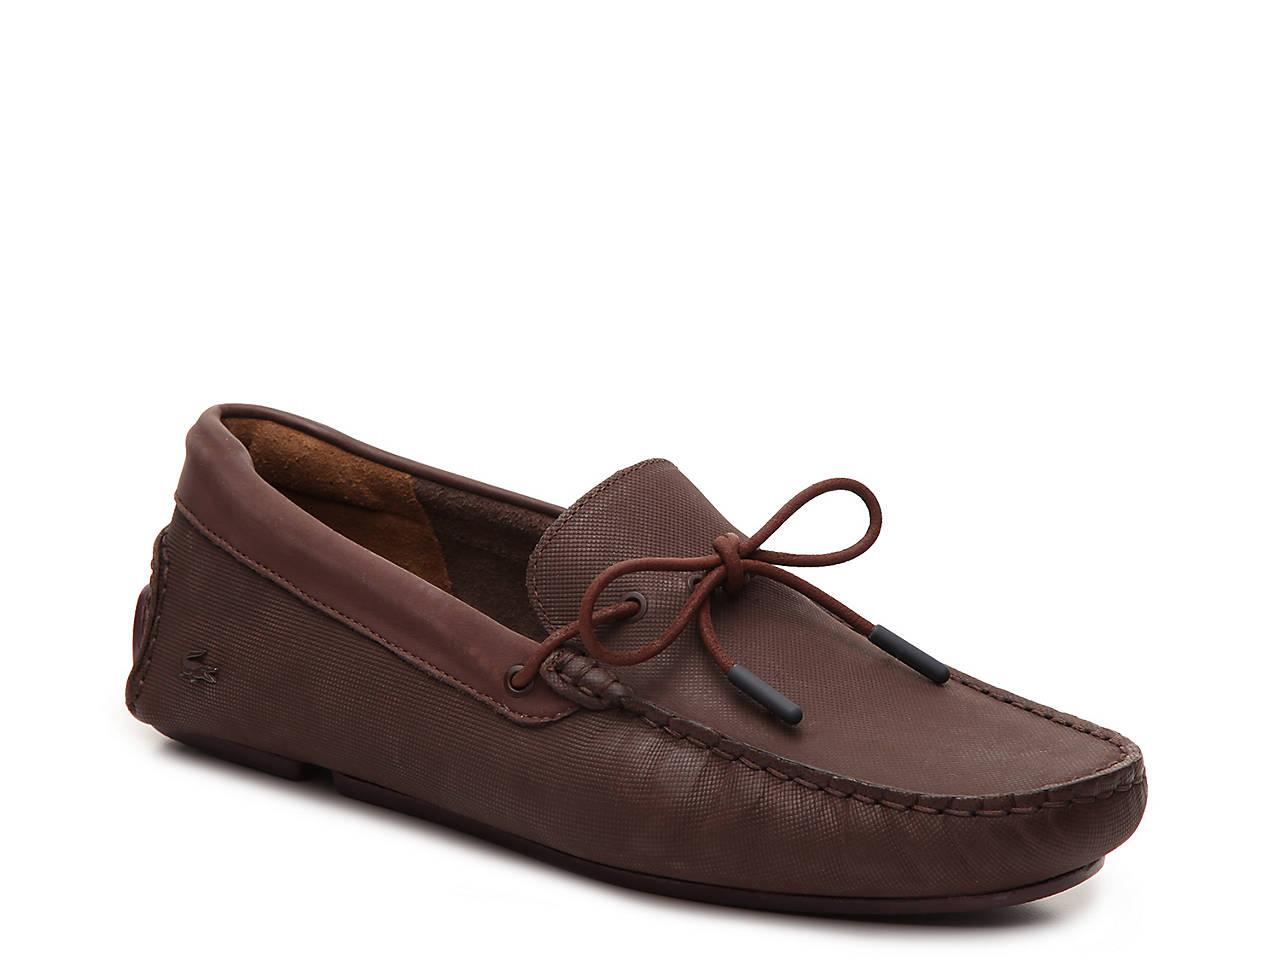 9d339882994 Lacoste Piloter Loafer Men s Shoes